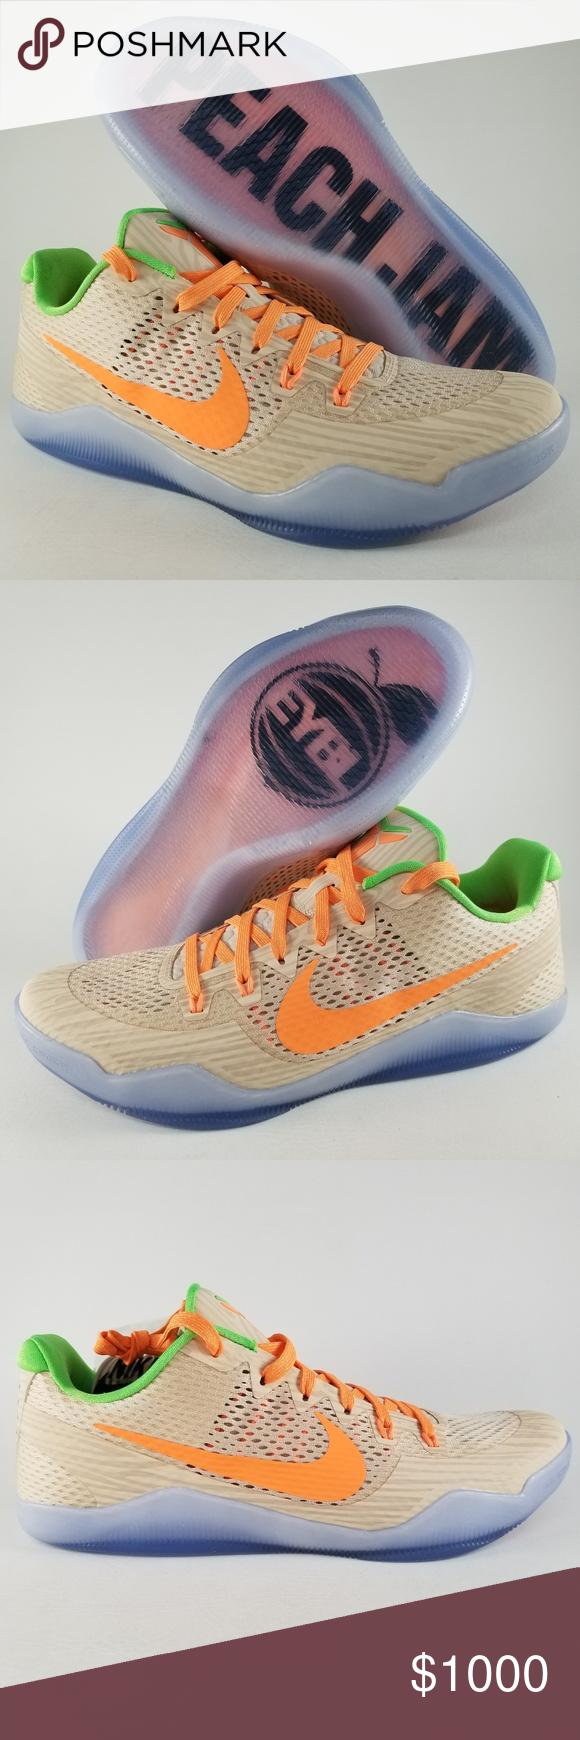 87d63436cce Nike Kobe XI Peach Jam Promo Men s BBall Shoes 13 Nike Kobe XI Peach Jam  Promo